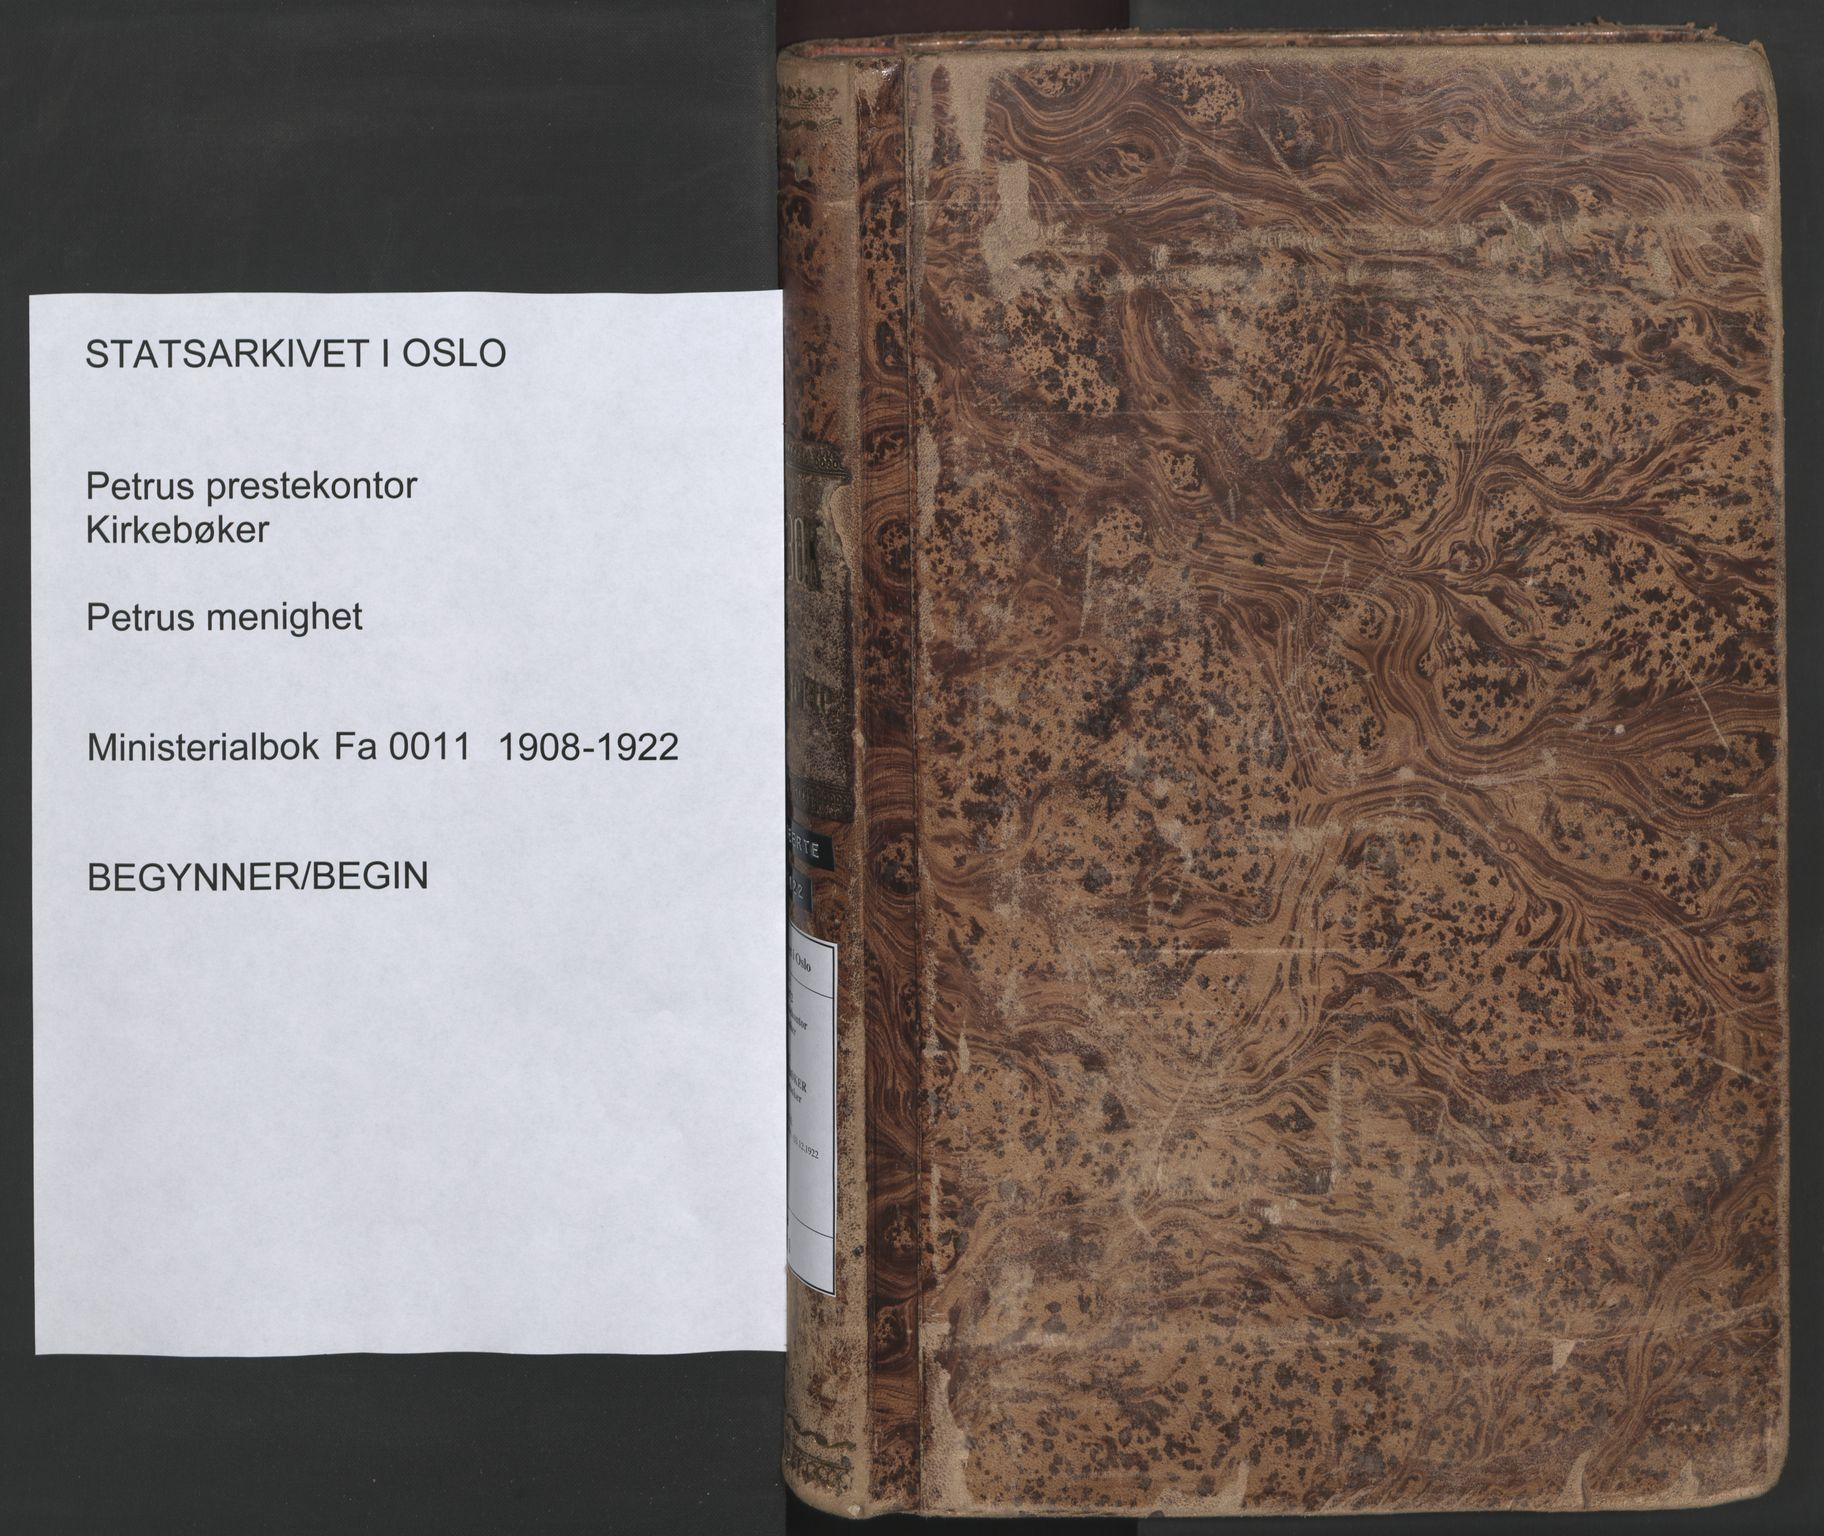 SAO, Petrus prestekontor Kirkebøker, F/Fa/L0011: Parish register (official) no. 11, 1908-1922